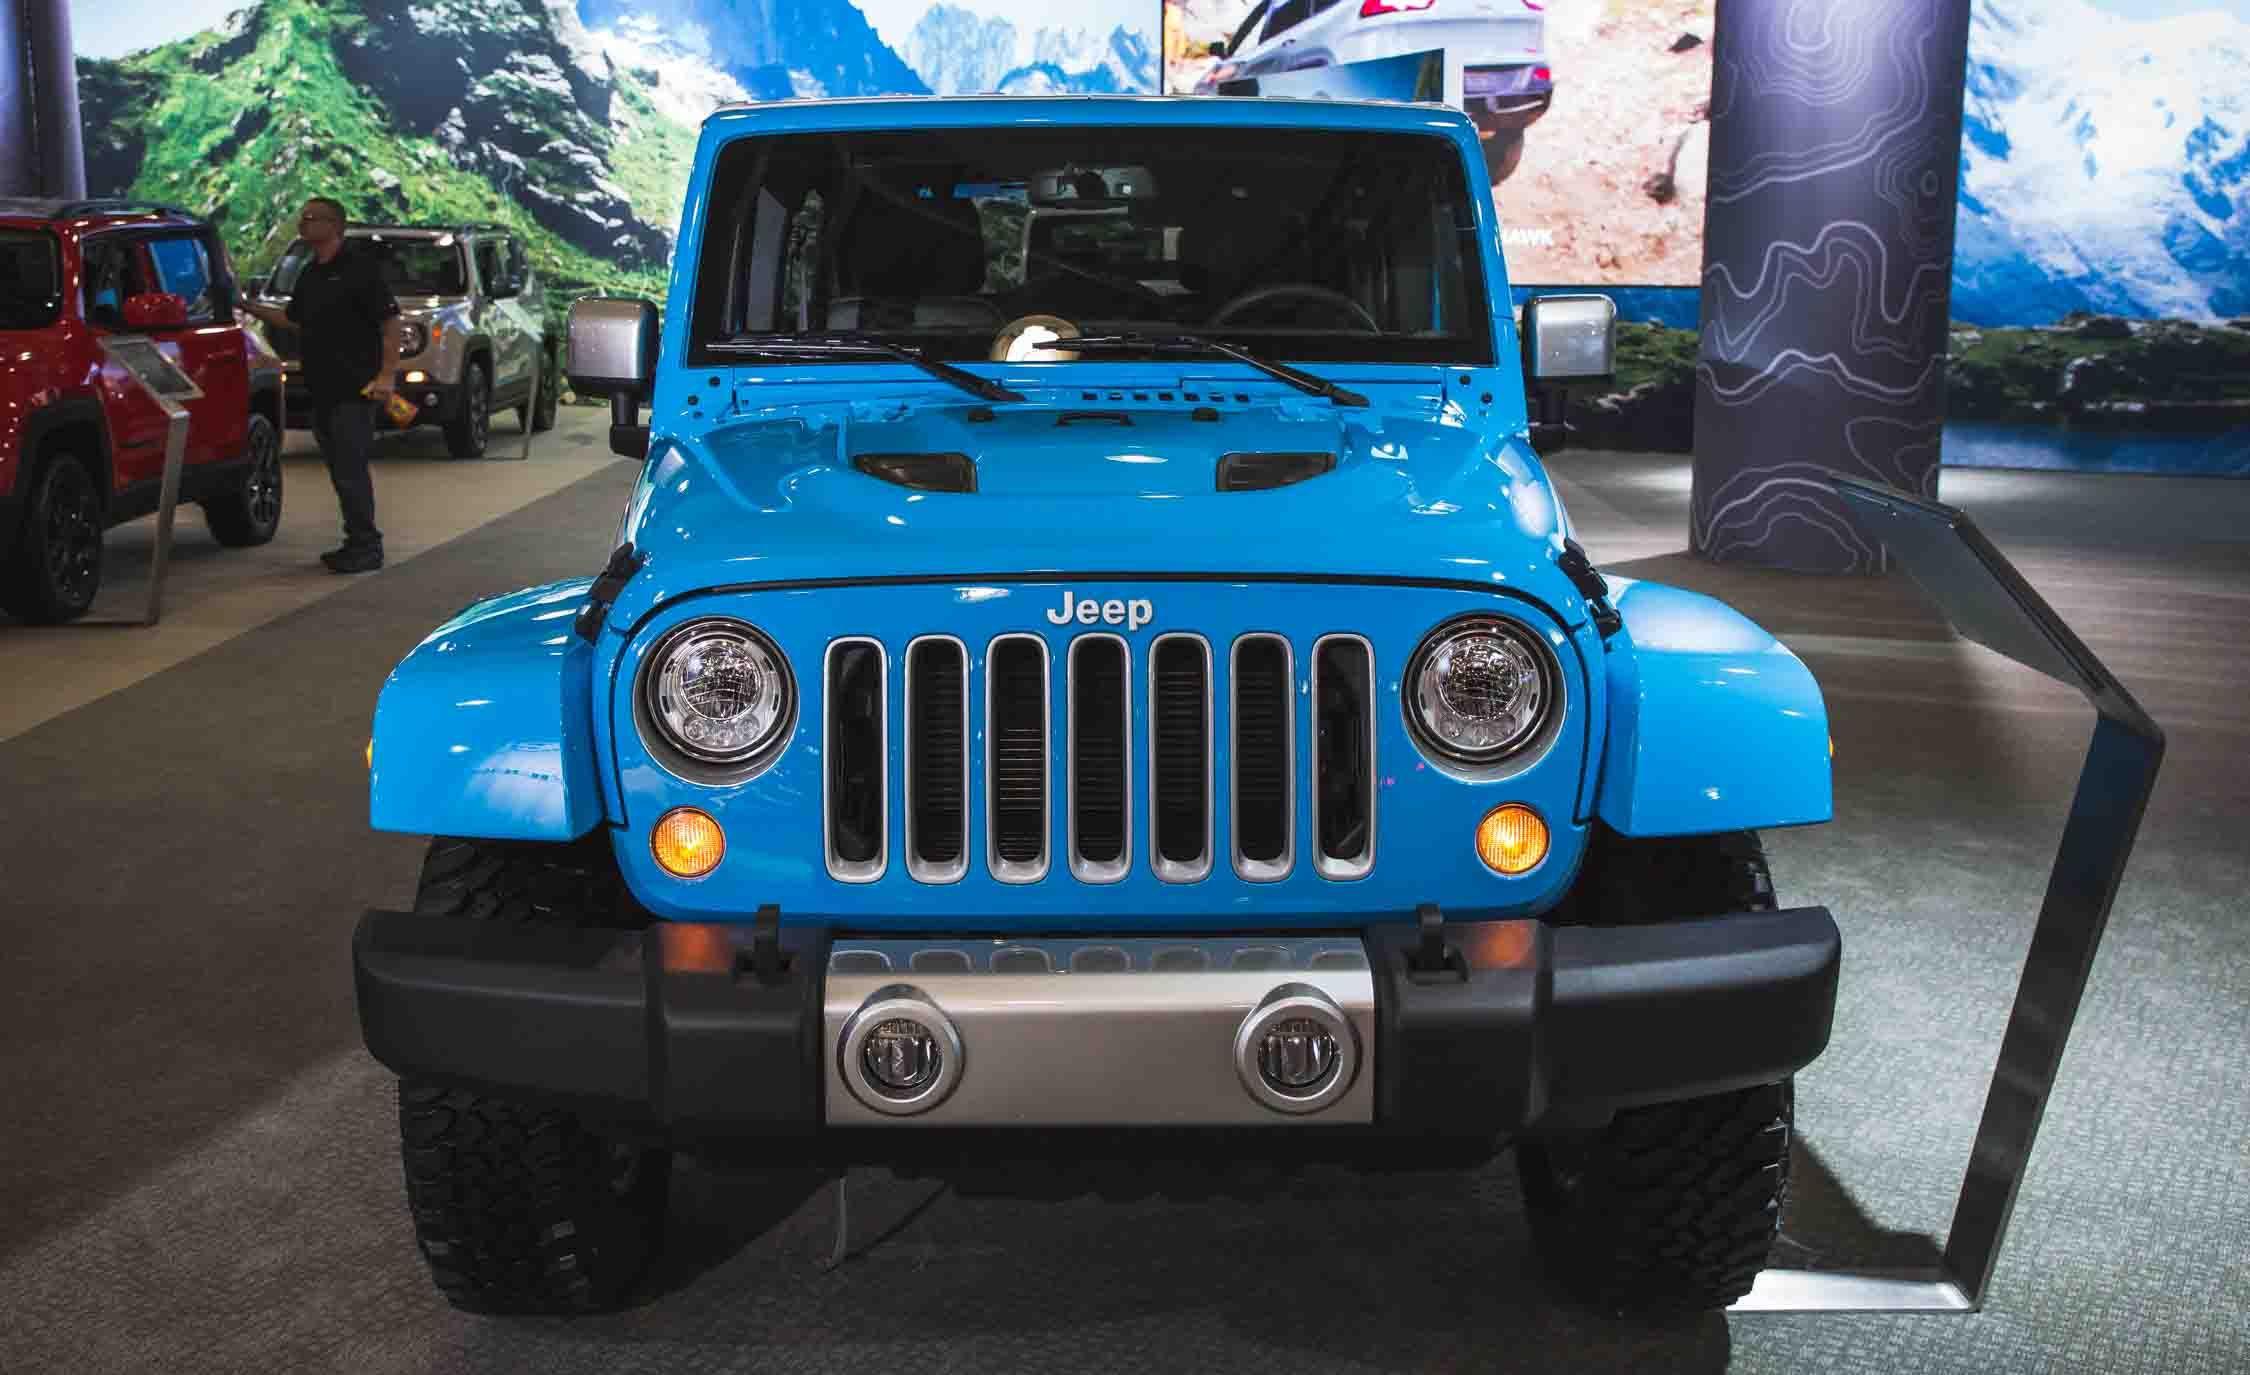 2017 Jeep Wrangler Unlimited 4door Pictures  Photo Gallery  Car